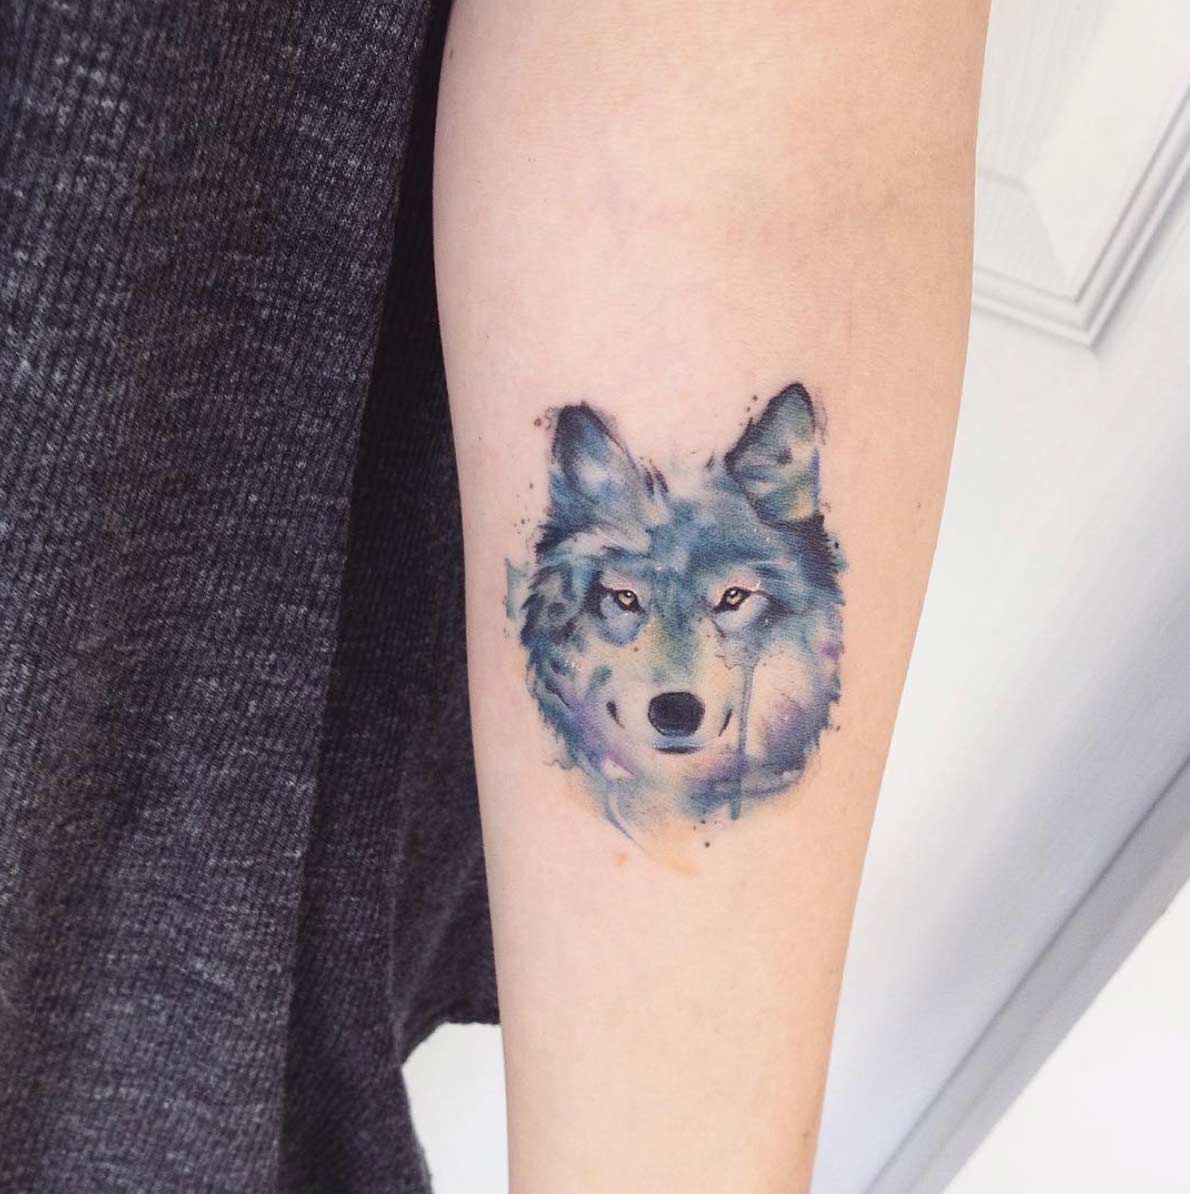 tatuagem feminina delicada de lobo 2021